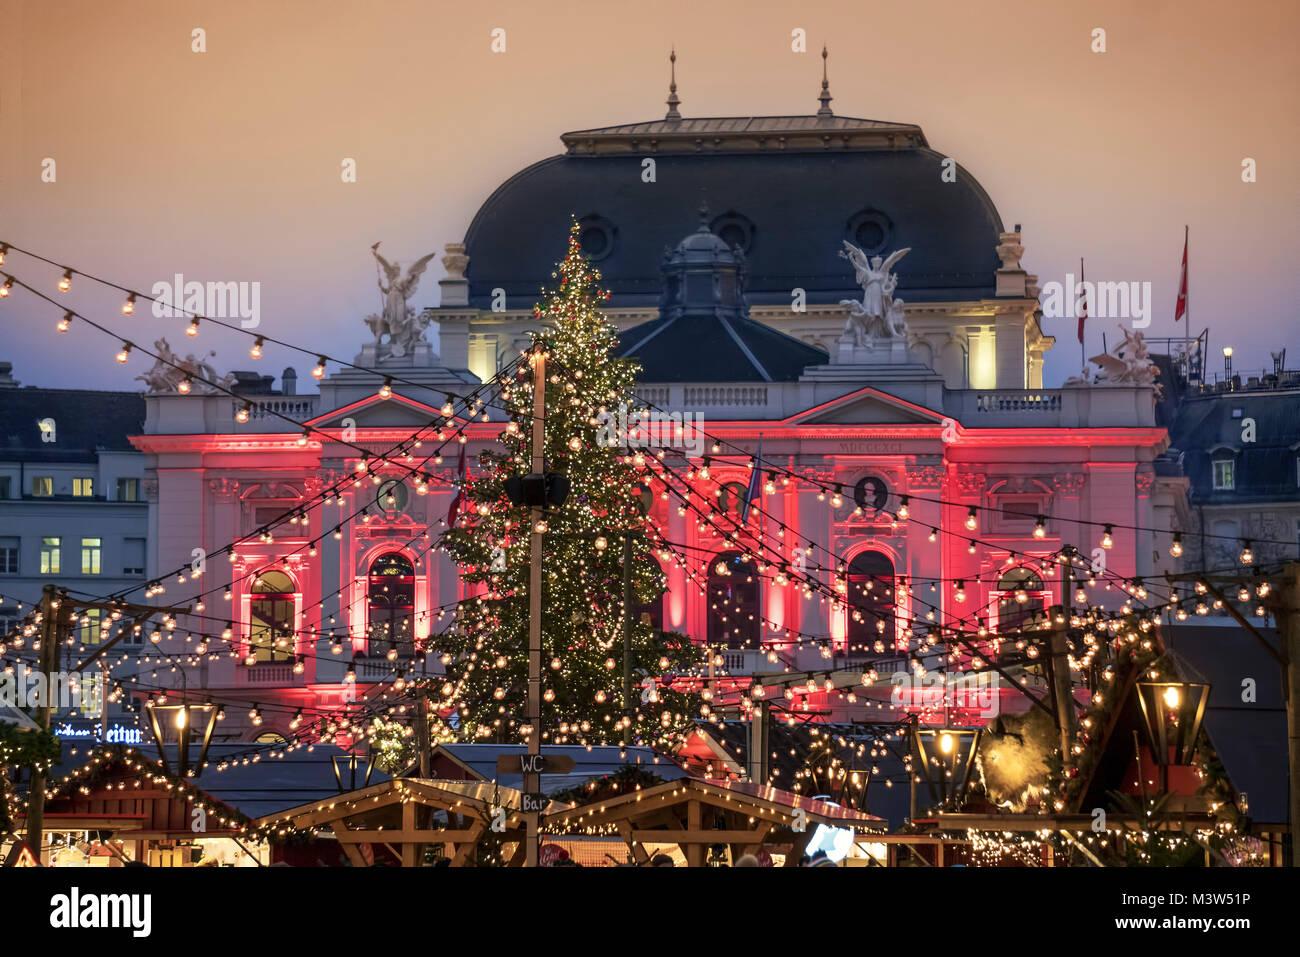 Christmas market, Sechselaeuten square, opera, Zurich, Switzerland - Stock Image